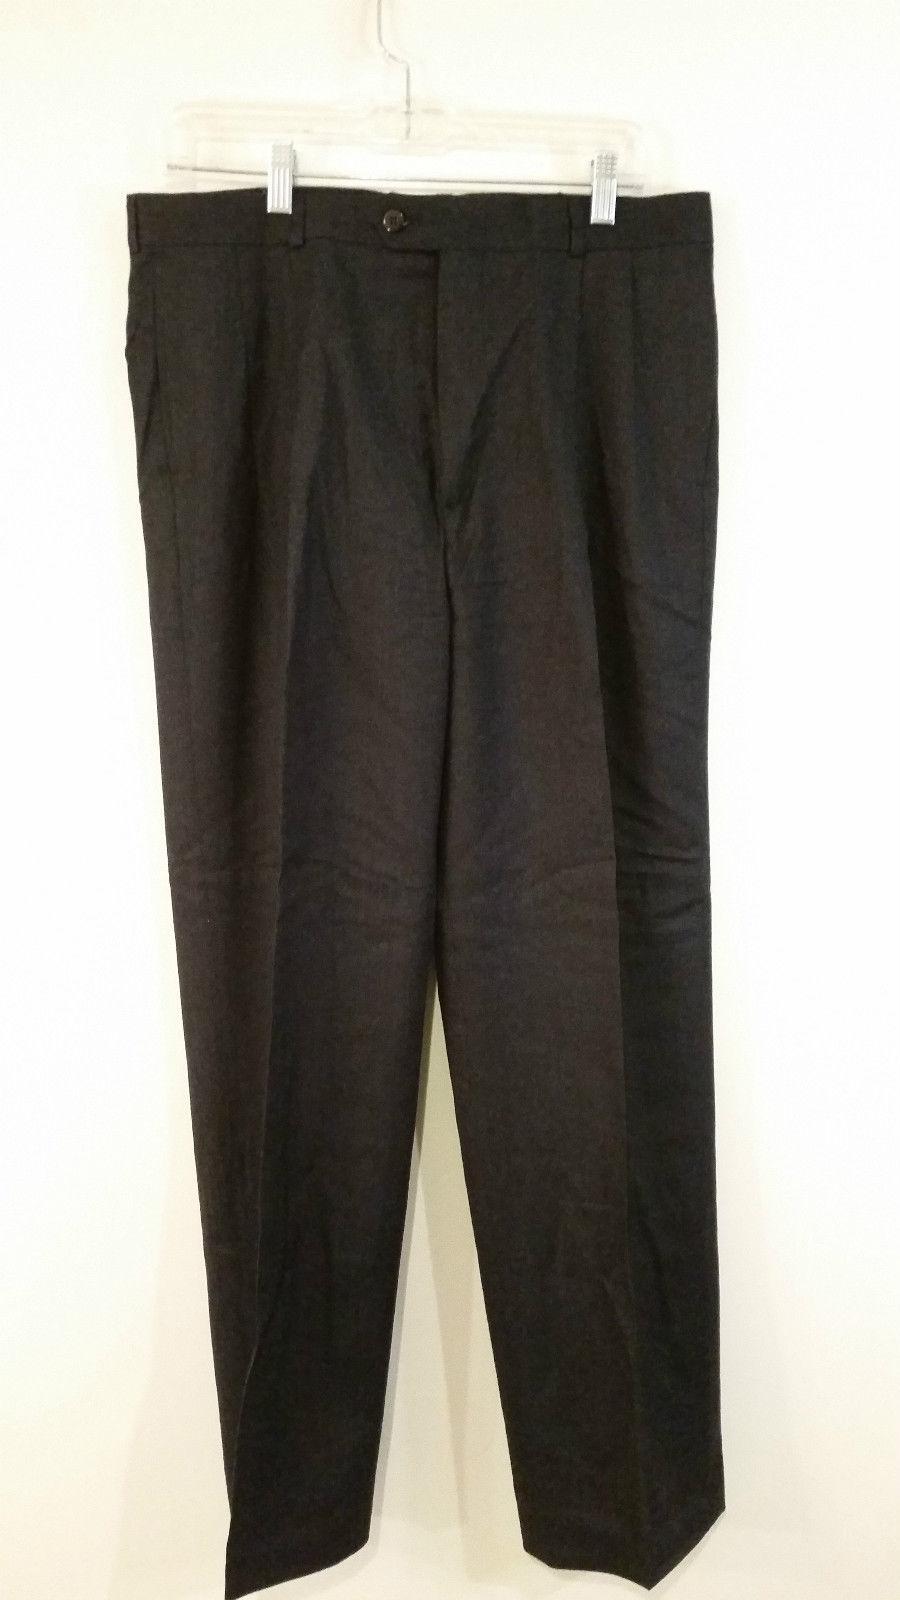 Dark Blue Pleated Front 100 Percent Wool Dress Pants No Tag Measurements Below